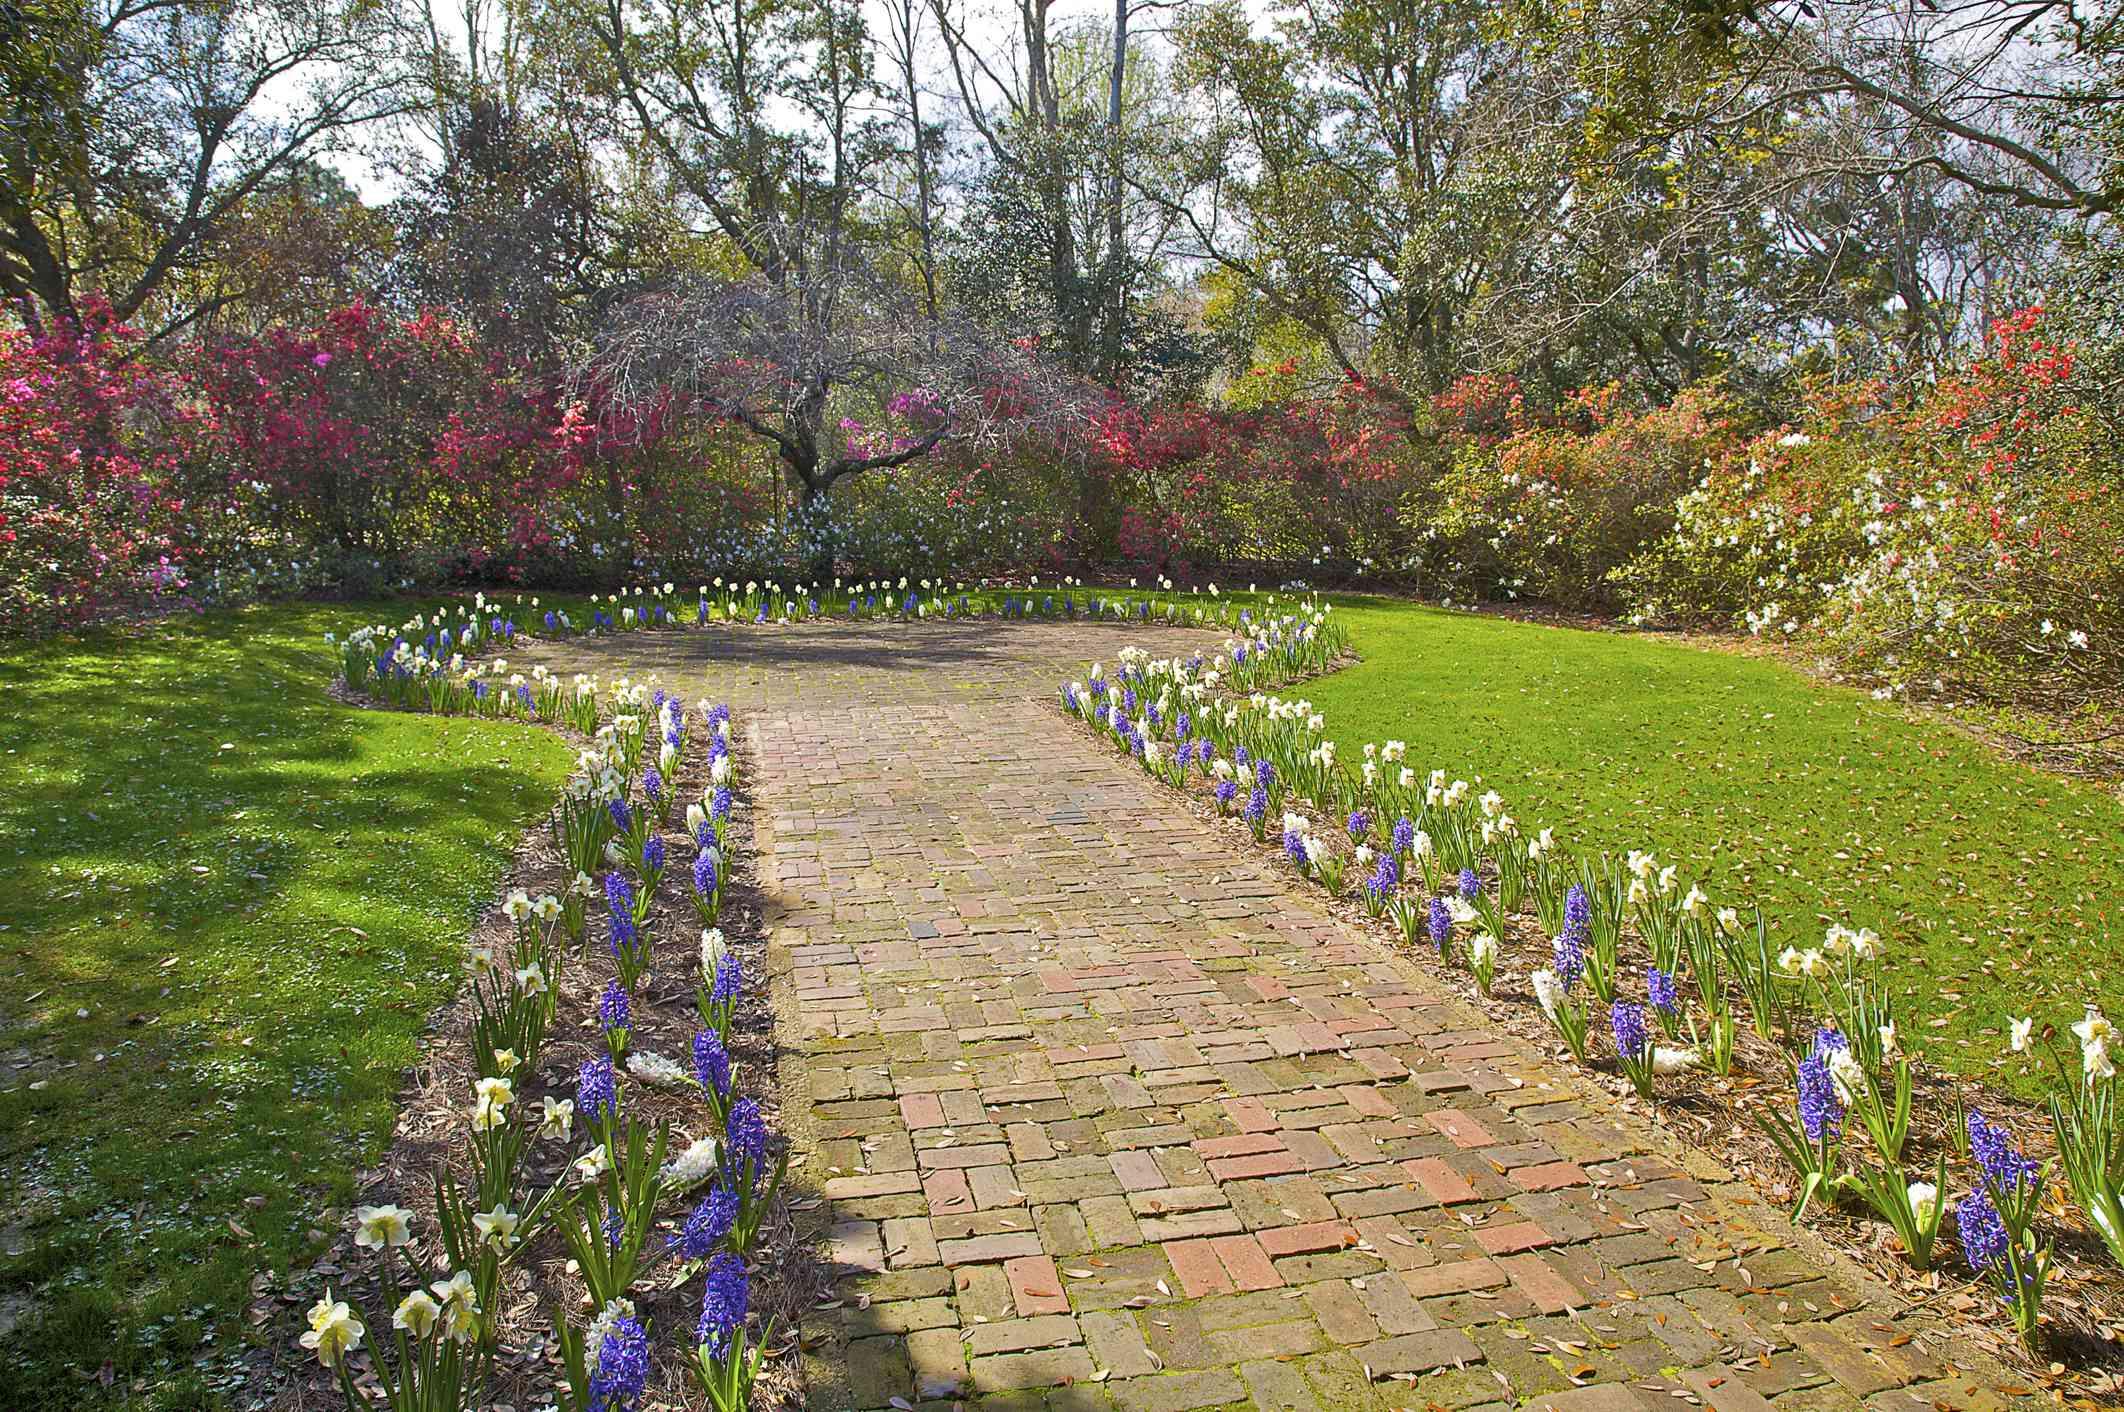 Brick path with hyacinths and azaleas in Mobile, Alabama